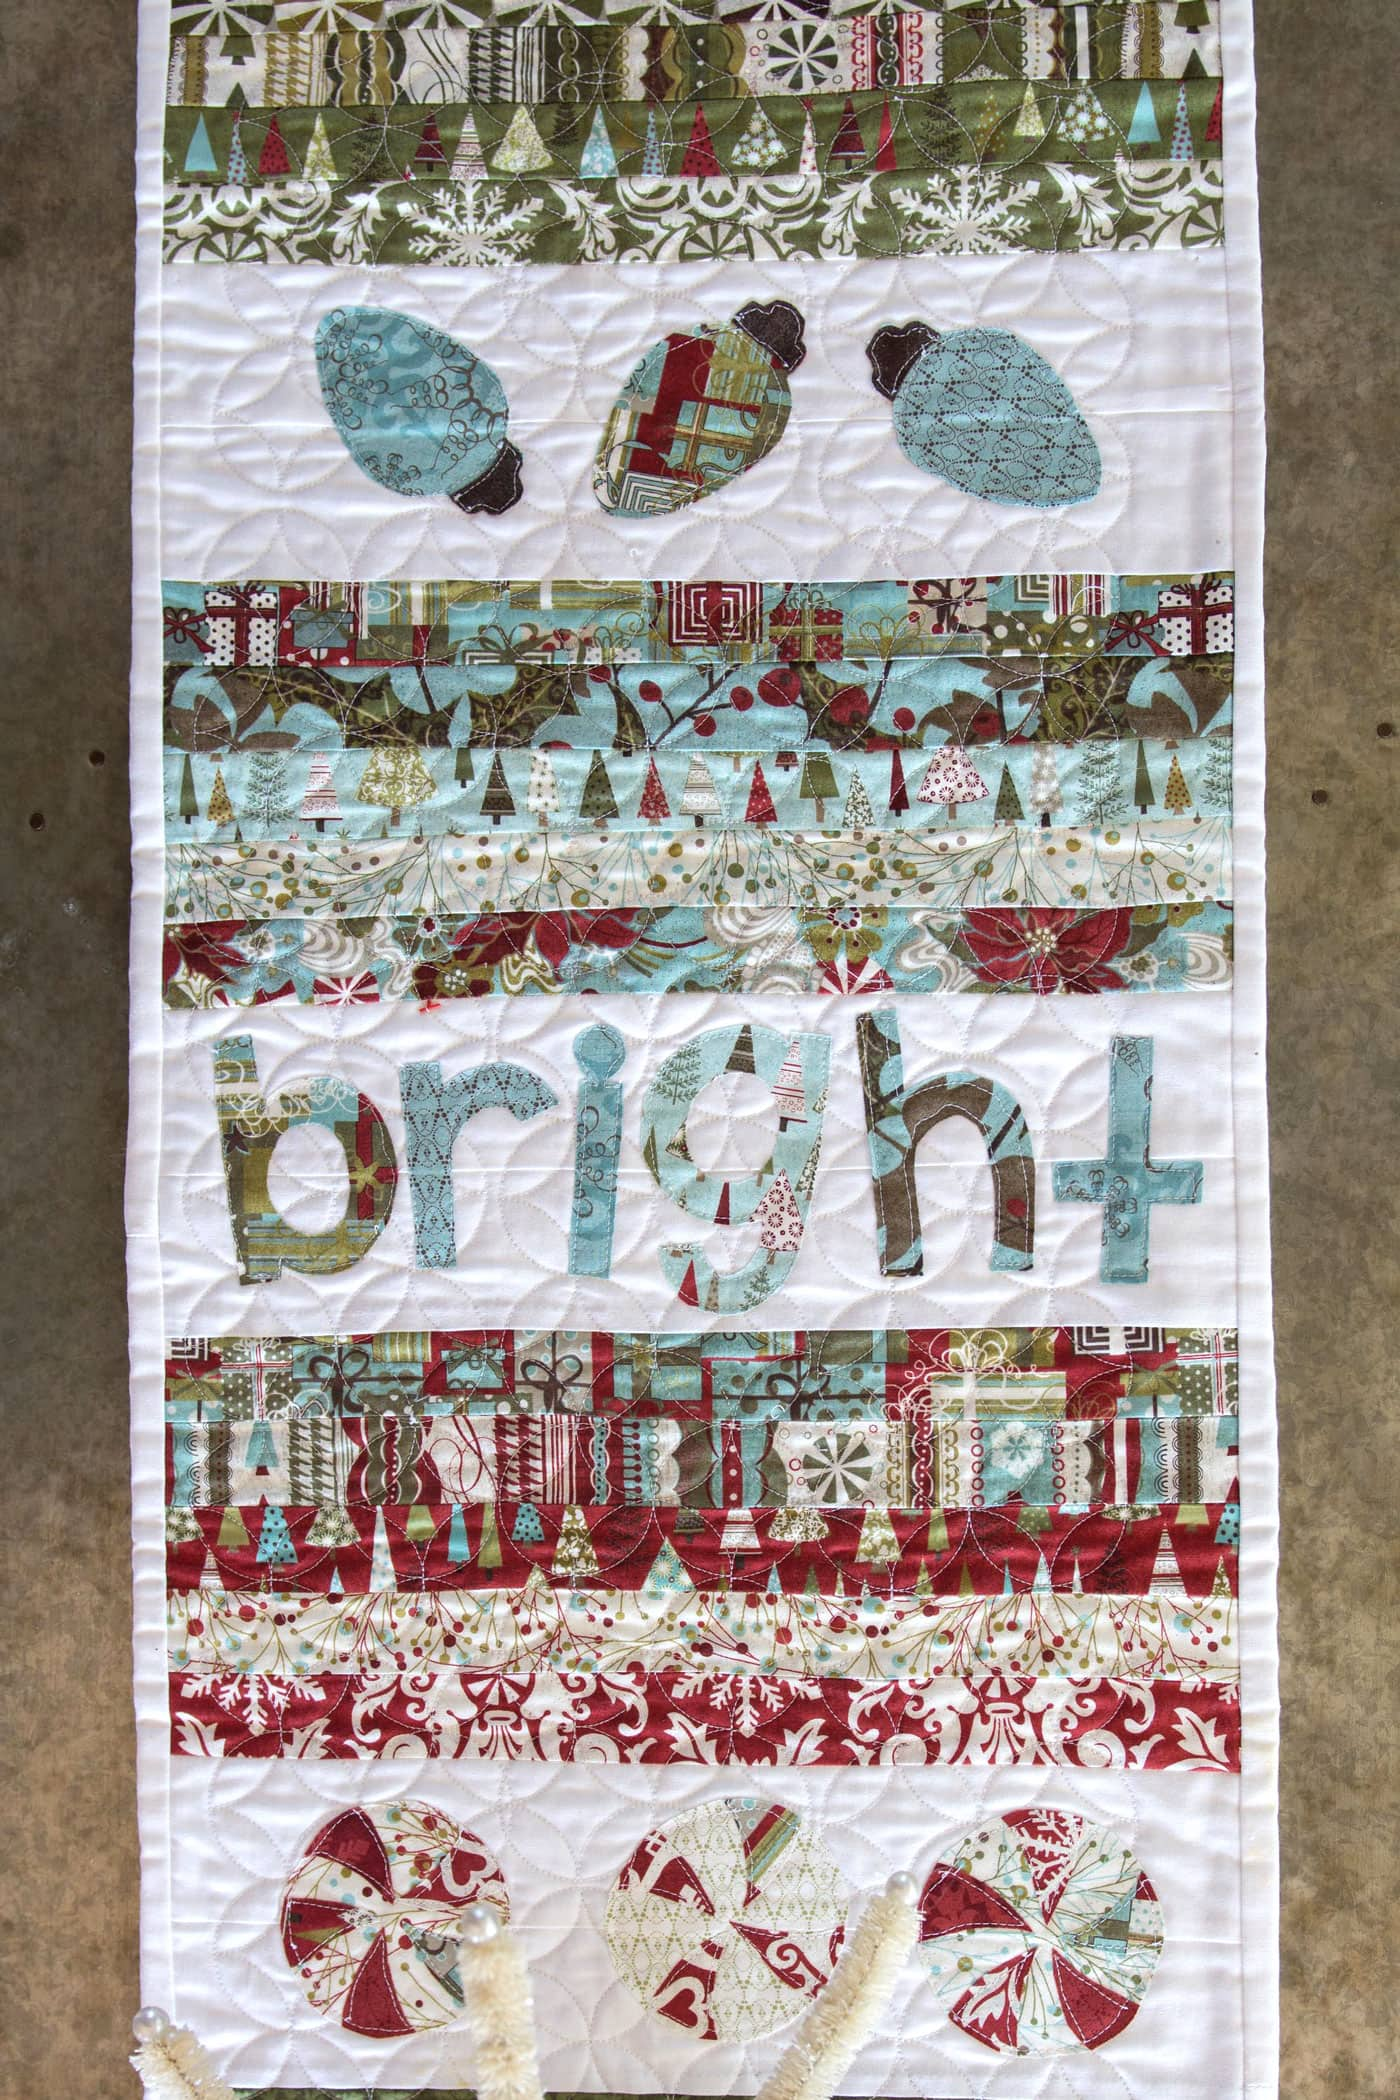 Free Printable Christmas Table Runner Quilt Patterns : Merry & Cheer Quilted Christmas Table Runner Pattern - The Polka Dot Chair